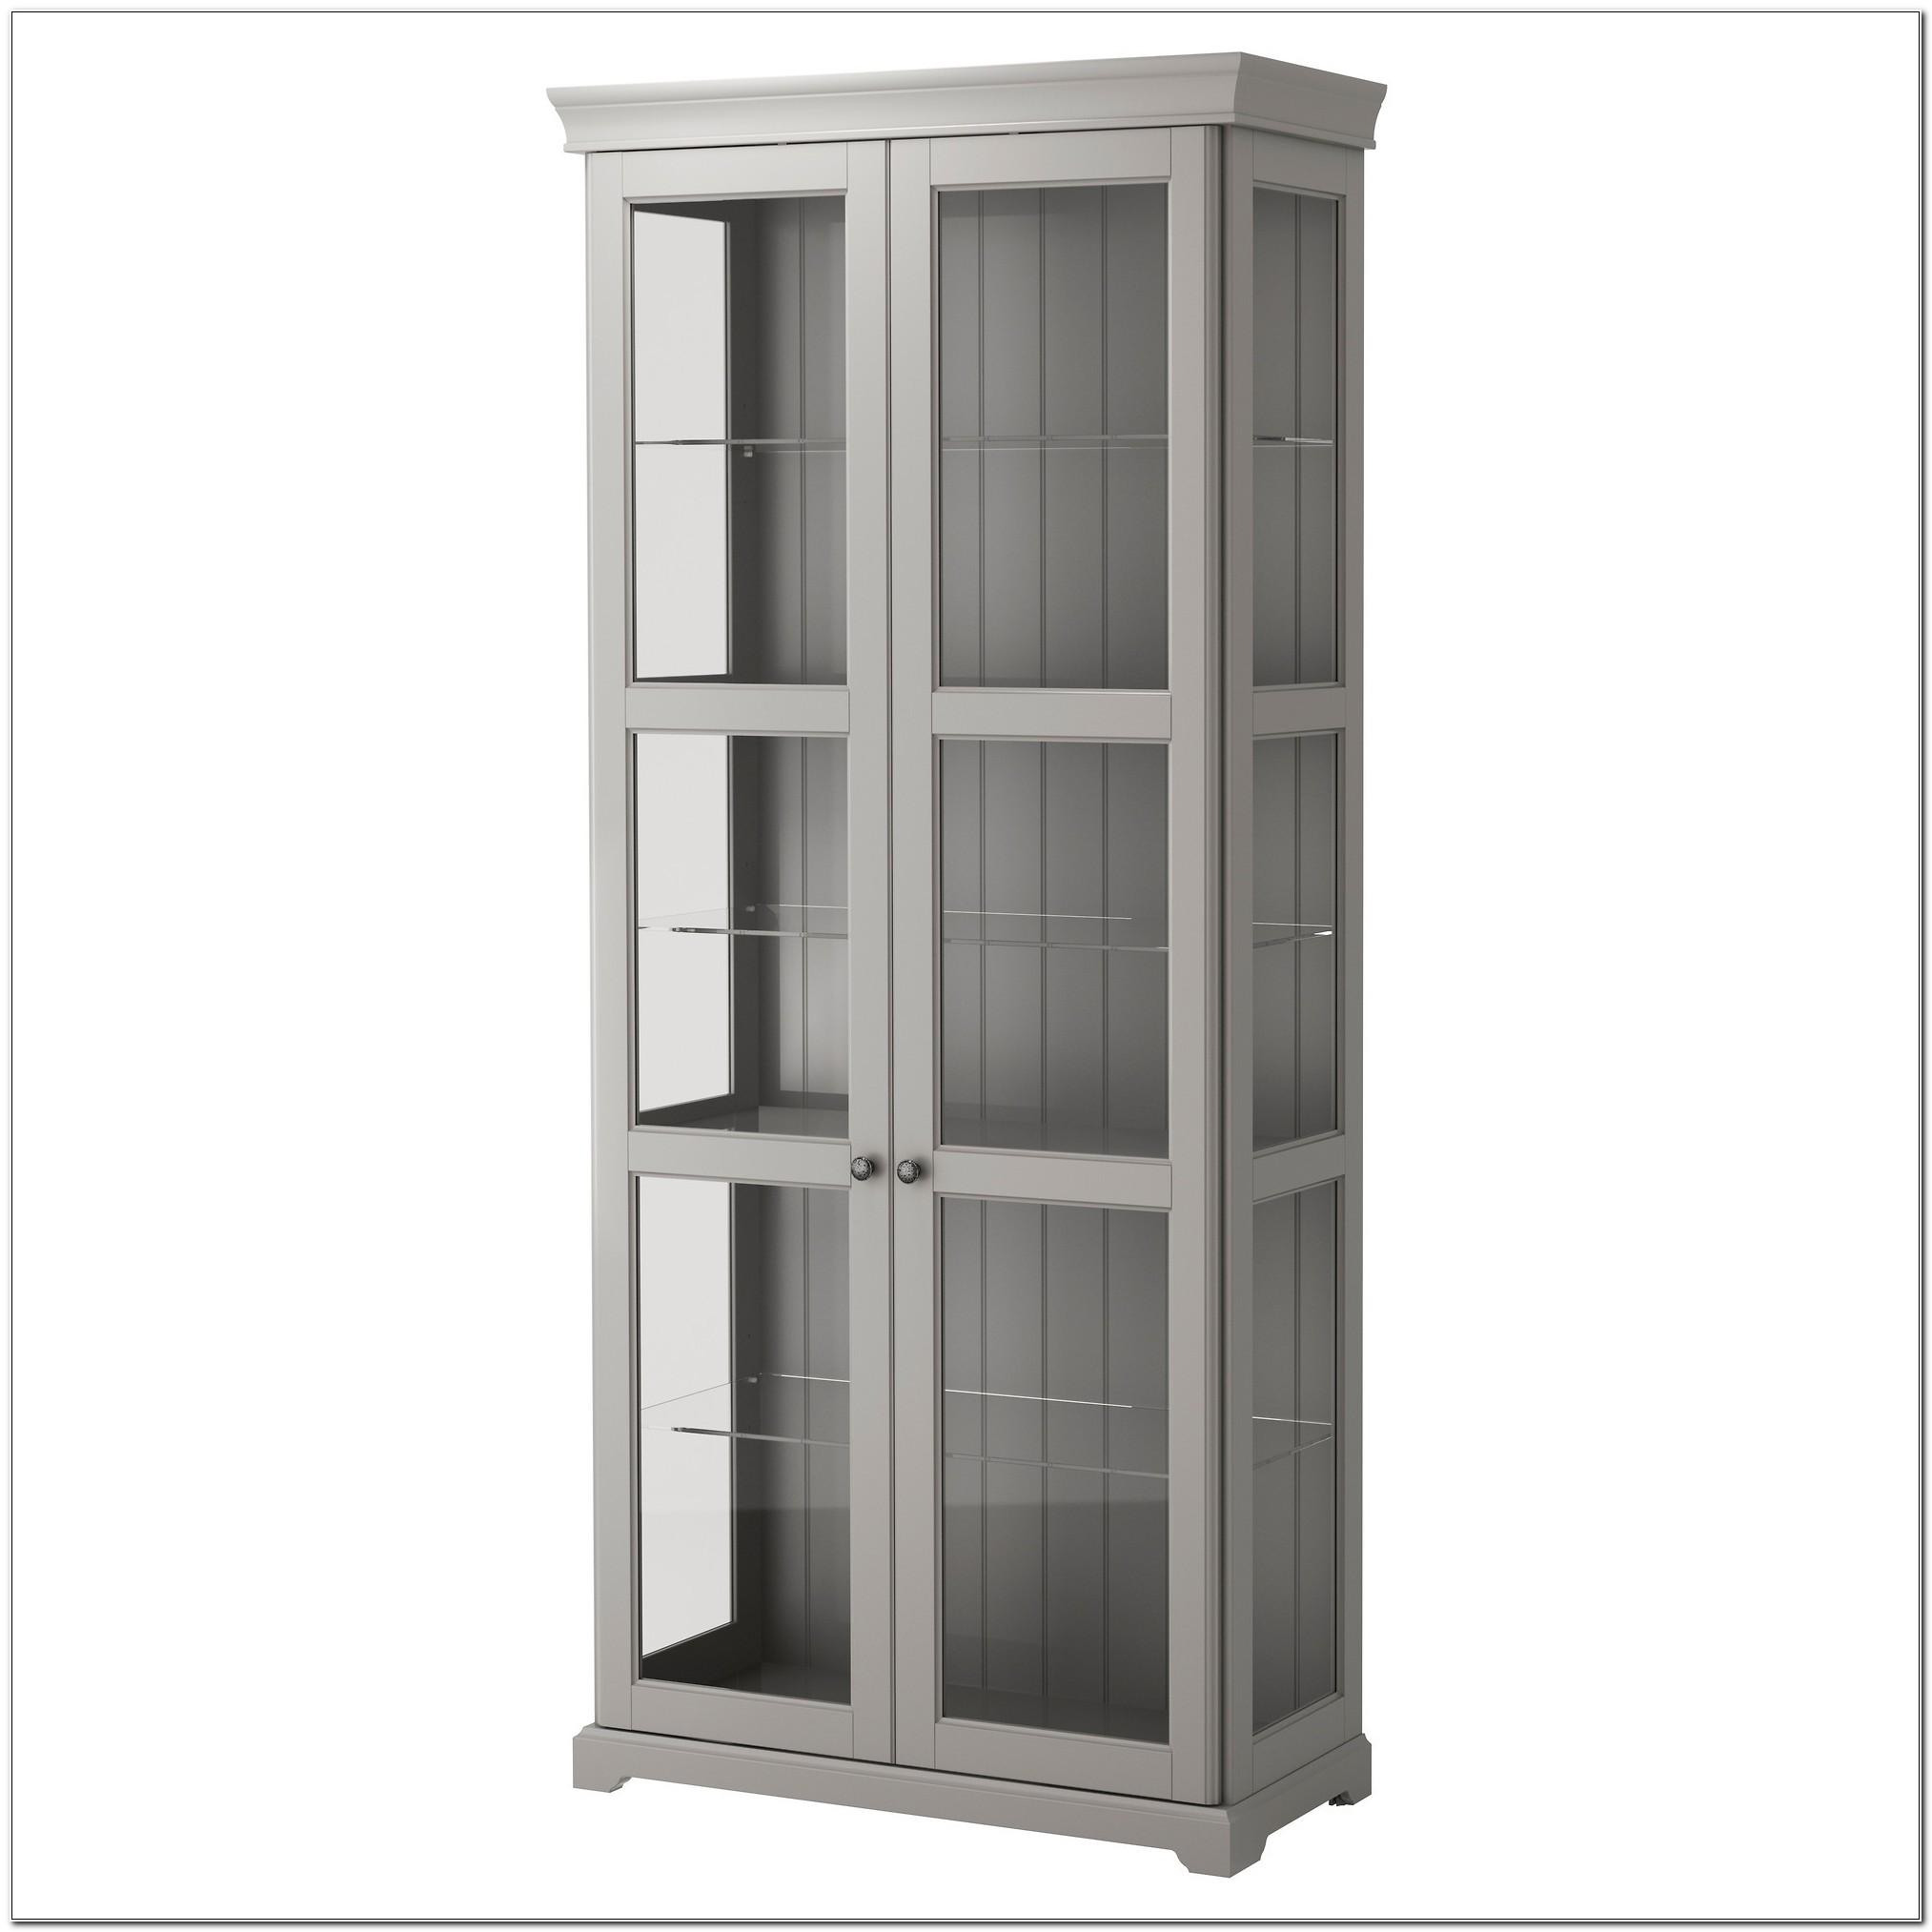 Ikea Wall Mounted Curio Cabinet